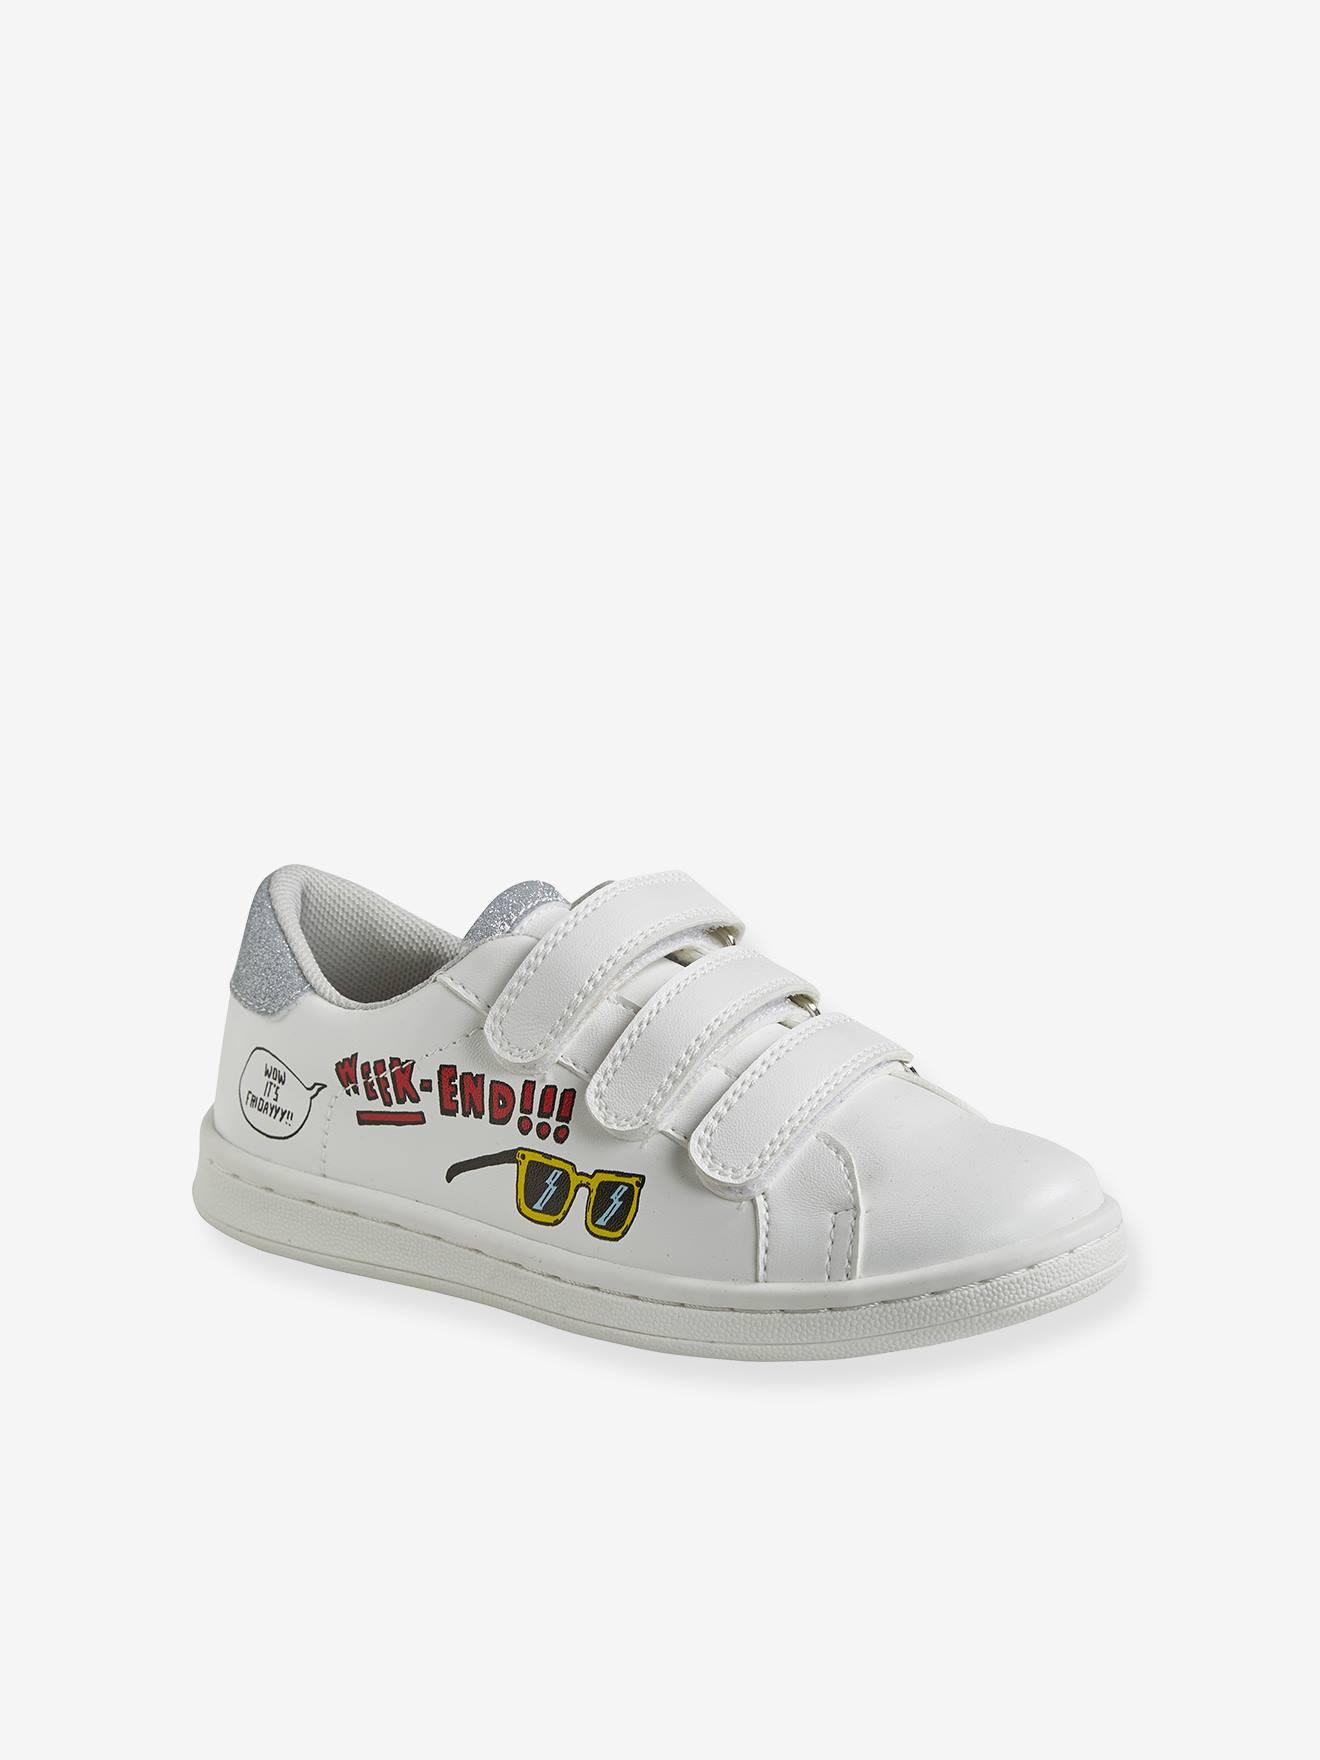 Mädchen Mit Klettverschluss Sneakers Sneakers Mit Weiß Klettverschluss Mädchen Weiß 1cJFlK3T